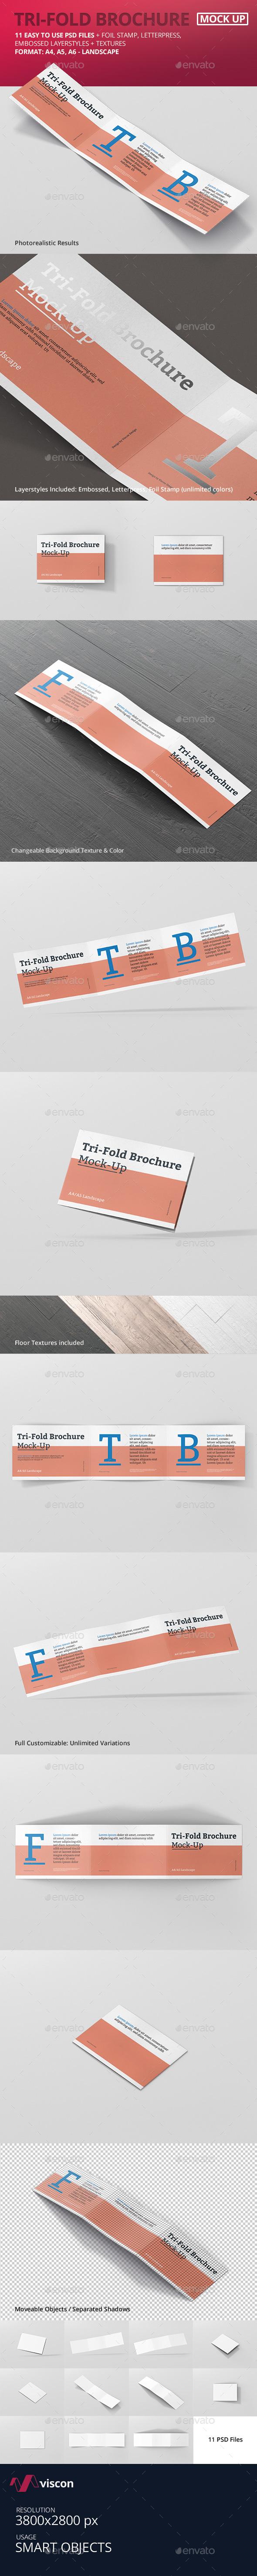 Tri-Fold Brochure Mockup - Din A4 A5 A6 Landscape - Brochures Print